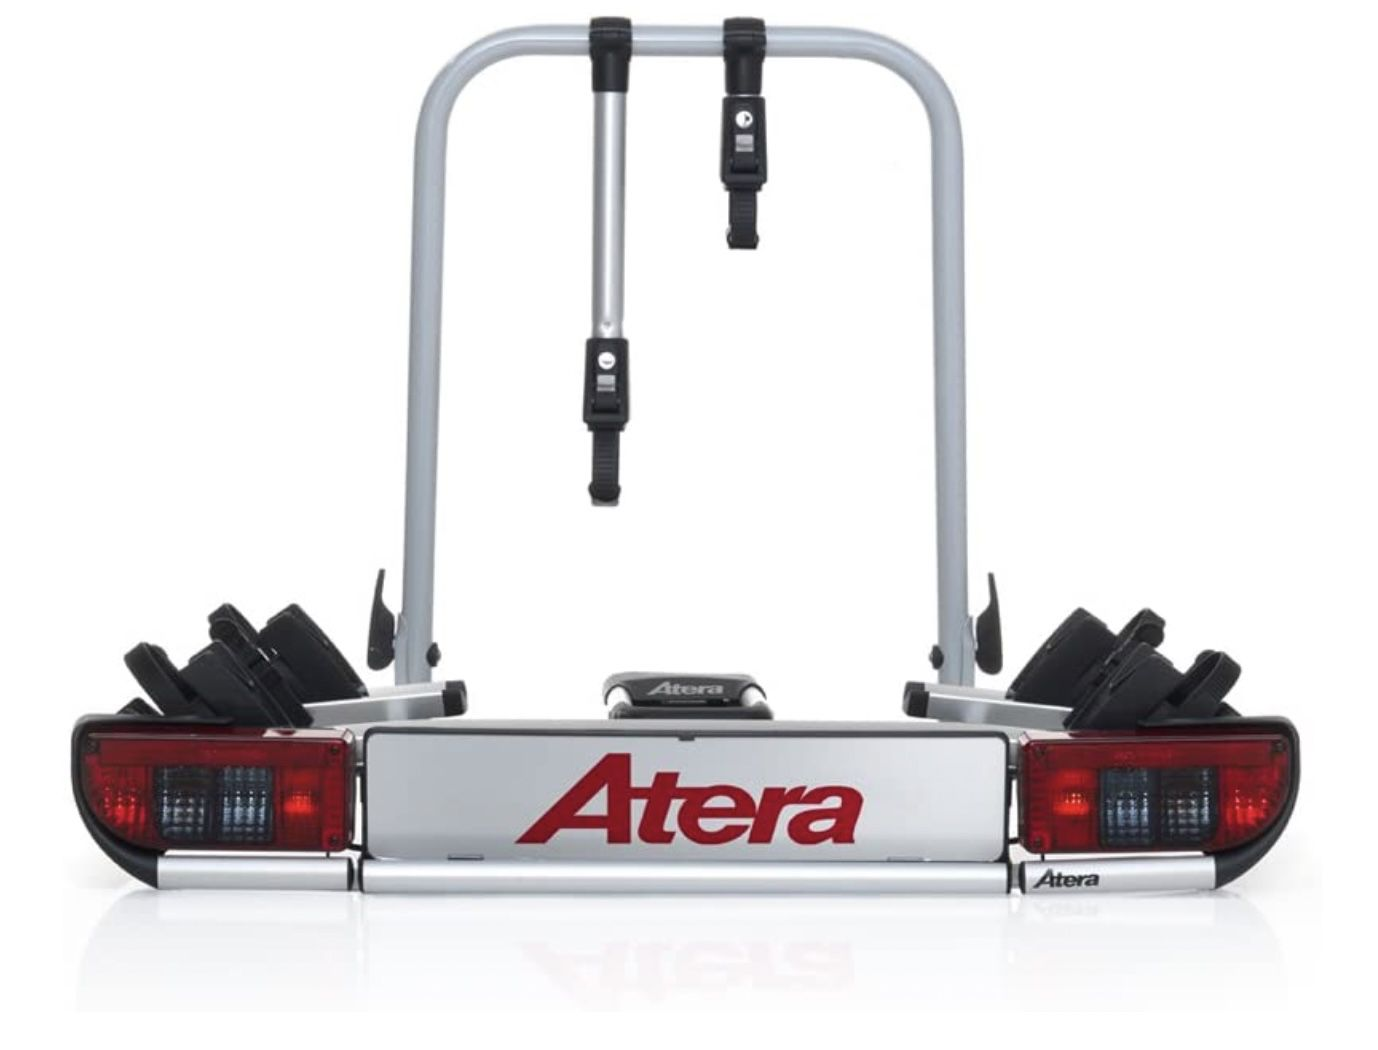 Atera Strada E-Bike M Heckträger für 2 E-Bikes für 279,99€ (statt 368€)